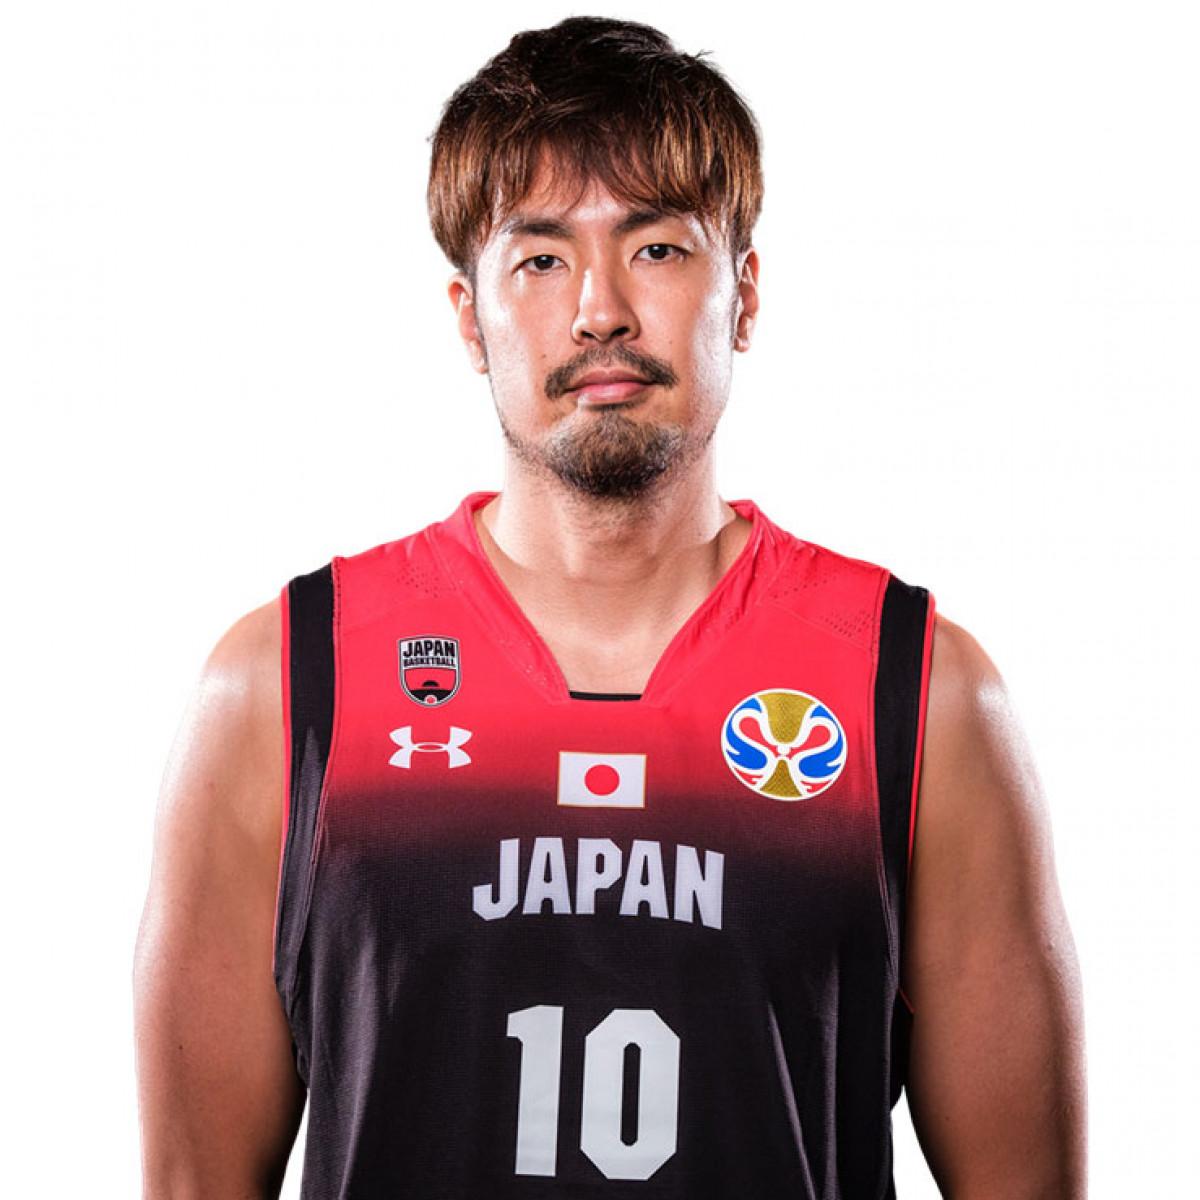 Photo of Kosuke Takeuchi, 2019-2020 season